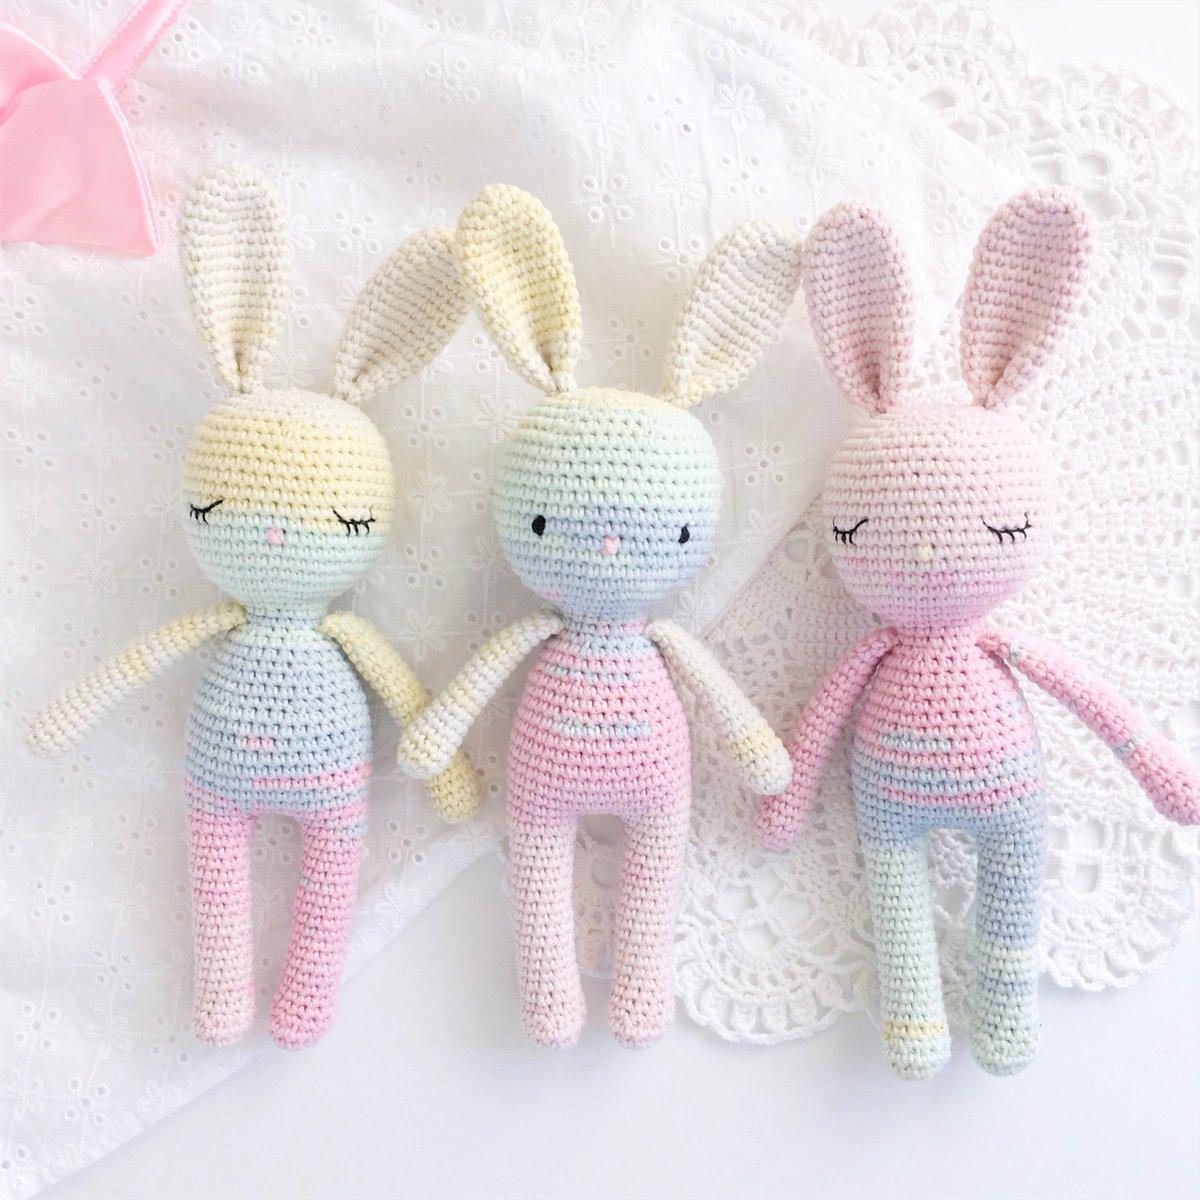 Amazon.com: Amigurumi crochet pattern charlie & angel bunny rabbit ... | 1200x1200